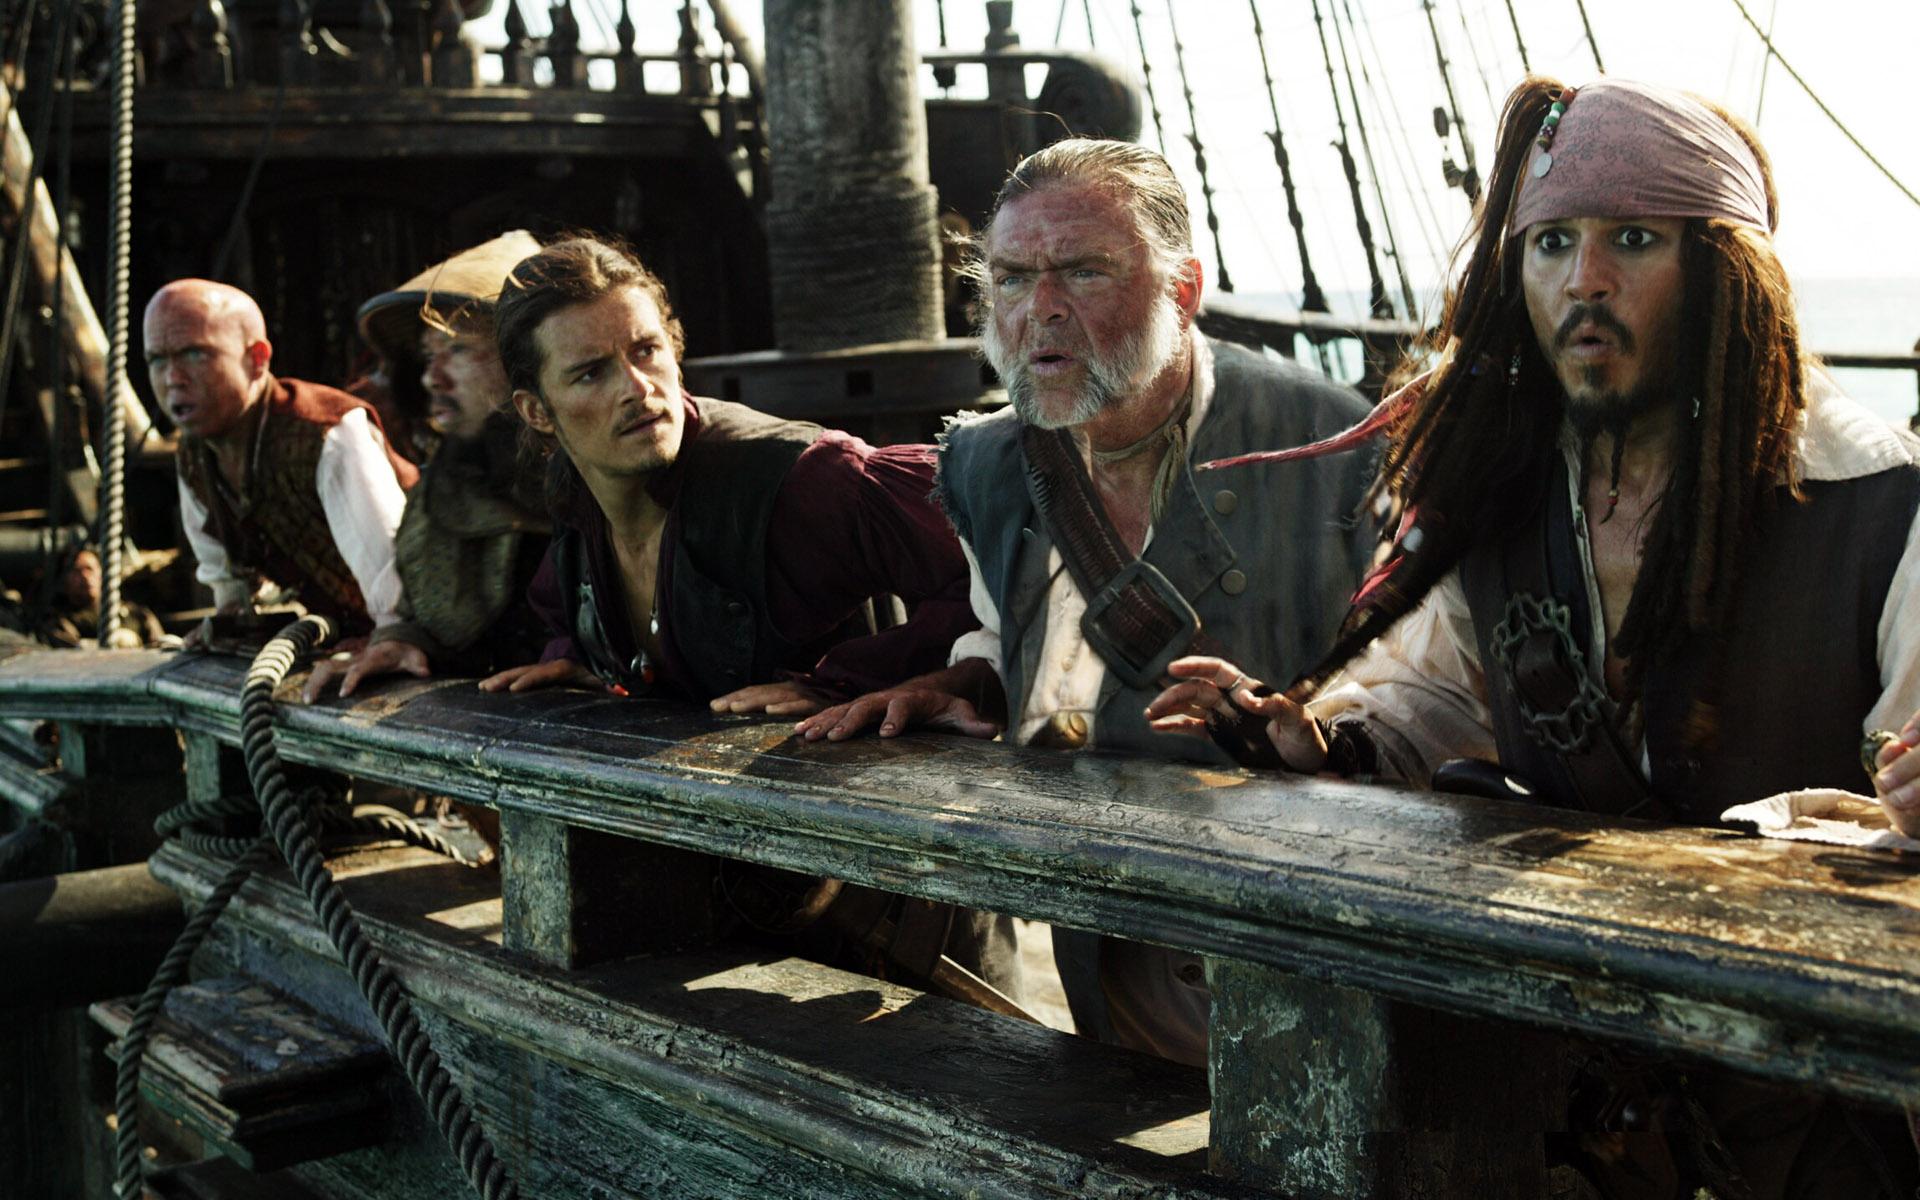 Movies_Movies_P_Pirates_of_the_Caribbean_009320_